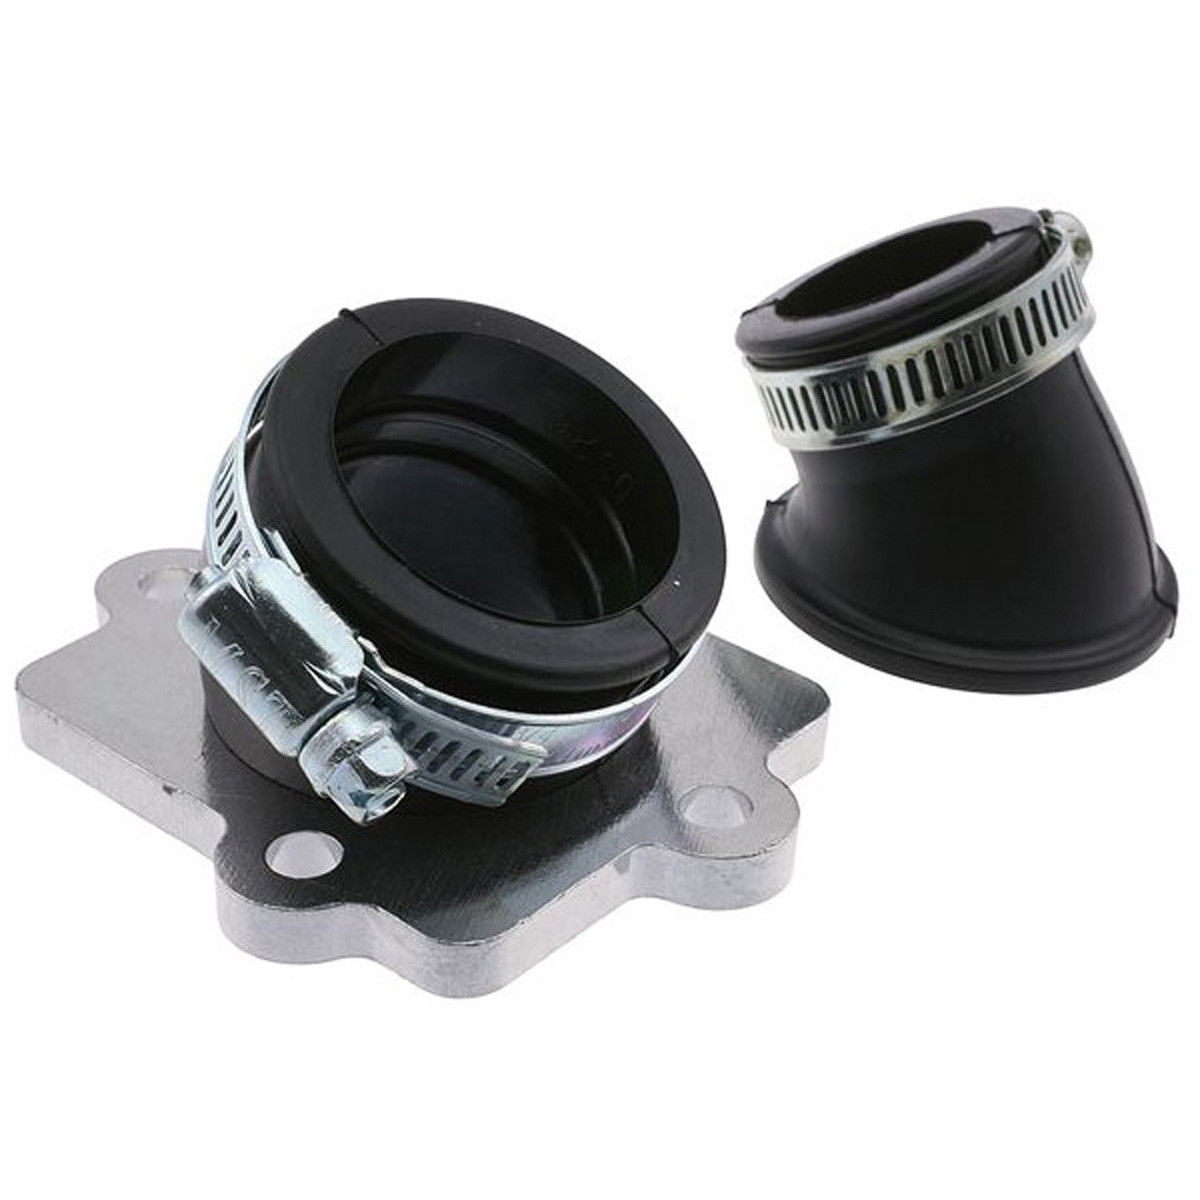 Pipe Admission MBK Nitro Ovetto YAMAHA Aerox Neo's - Motoforce 15 à 32mm